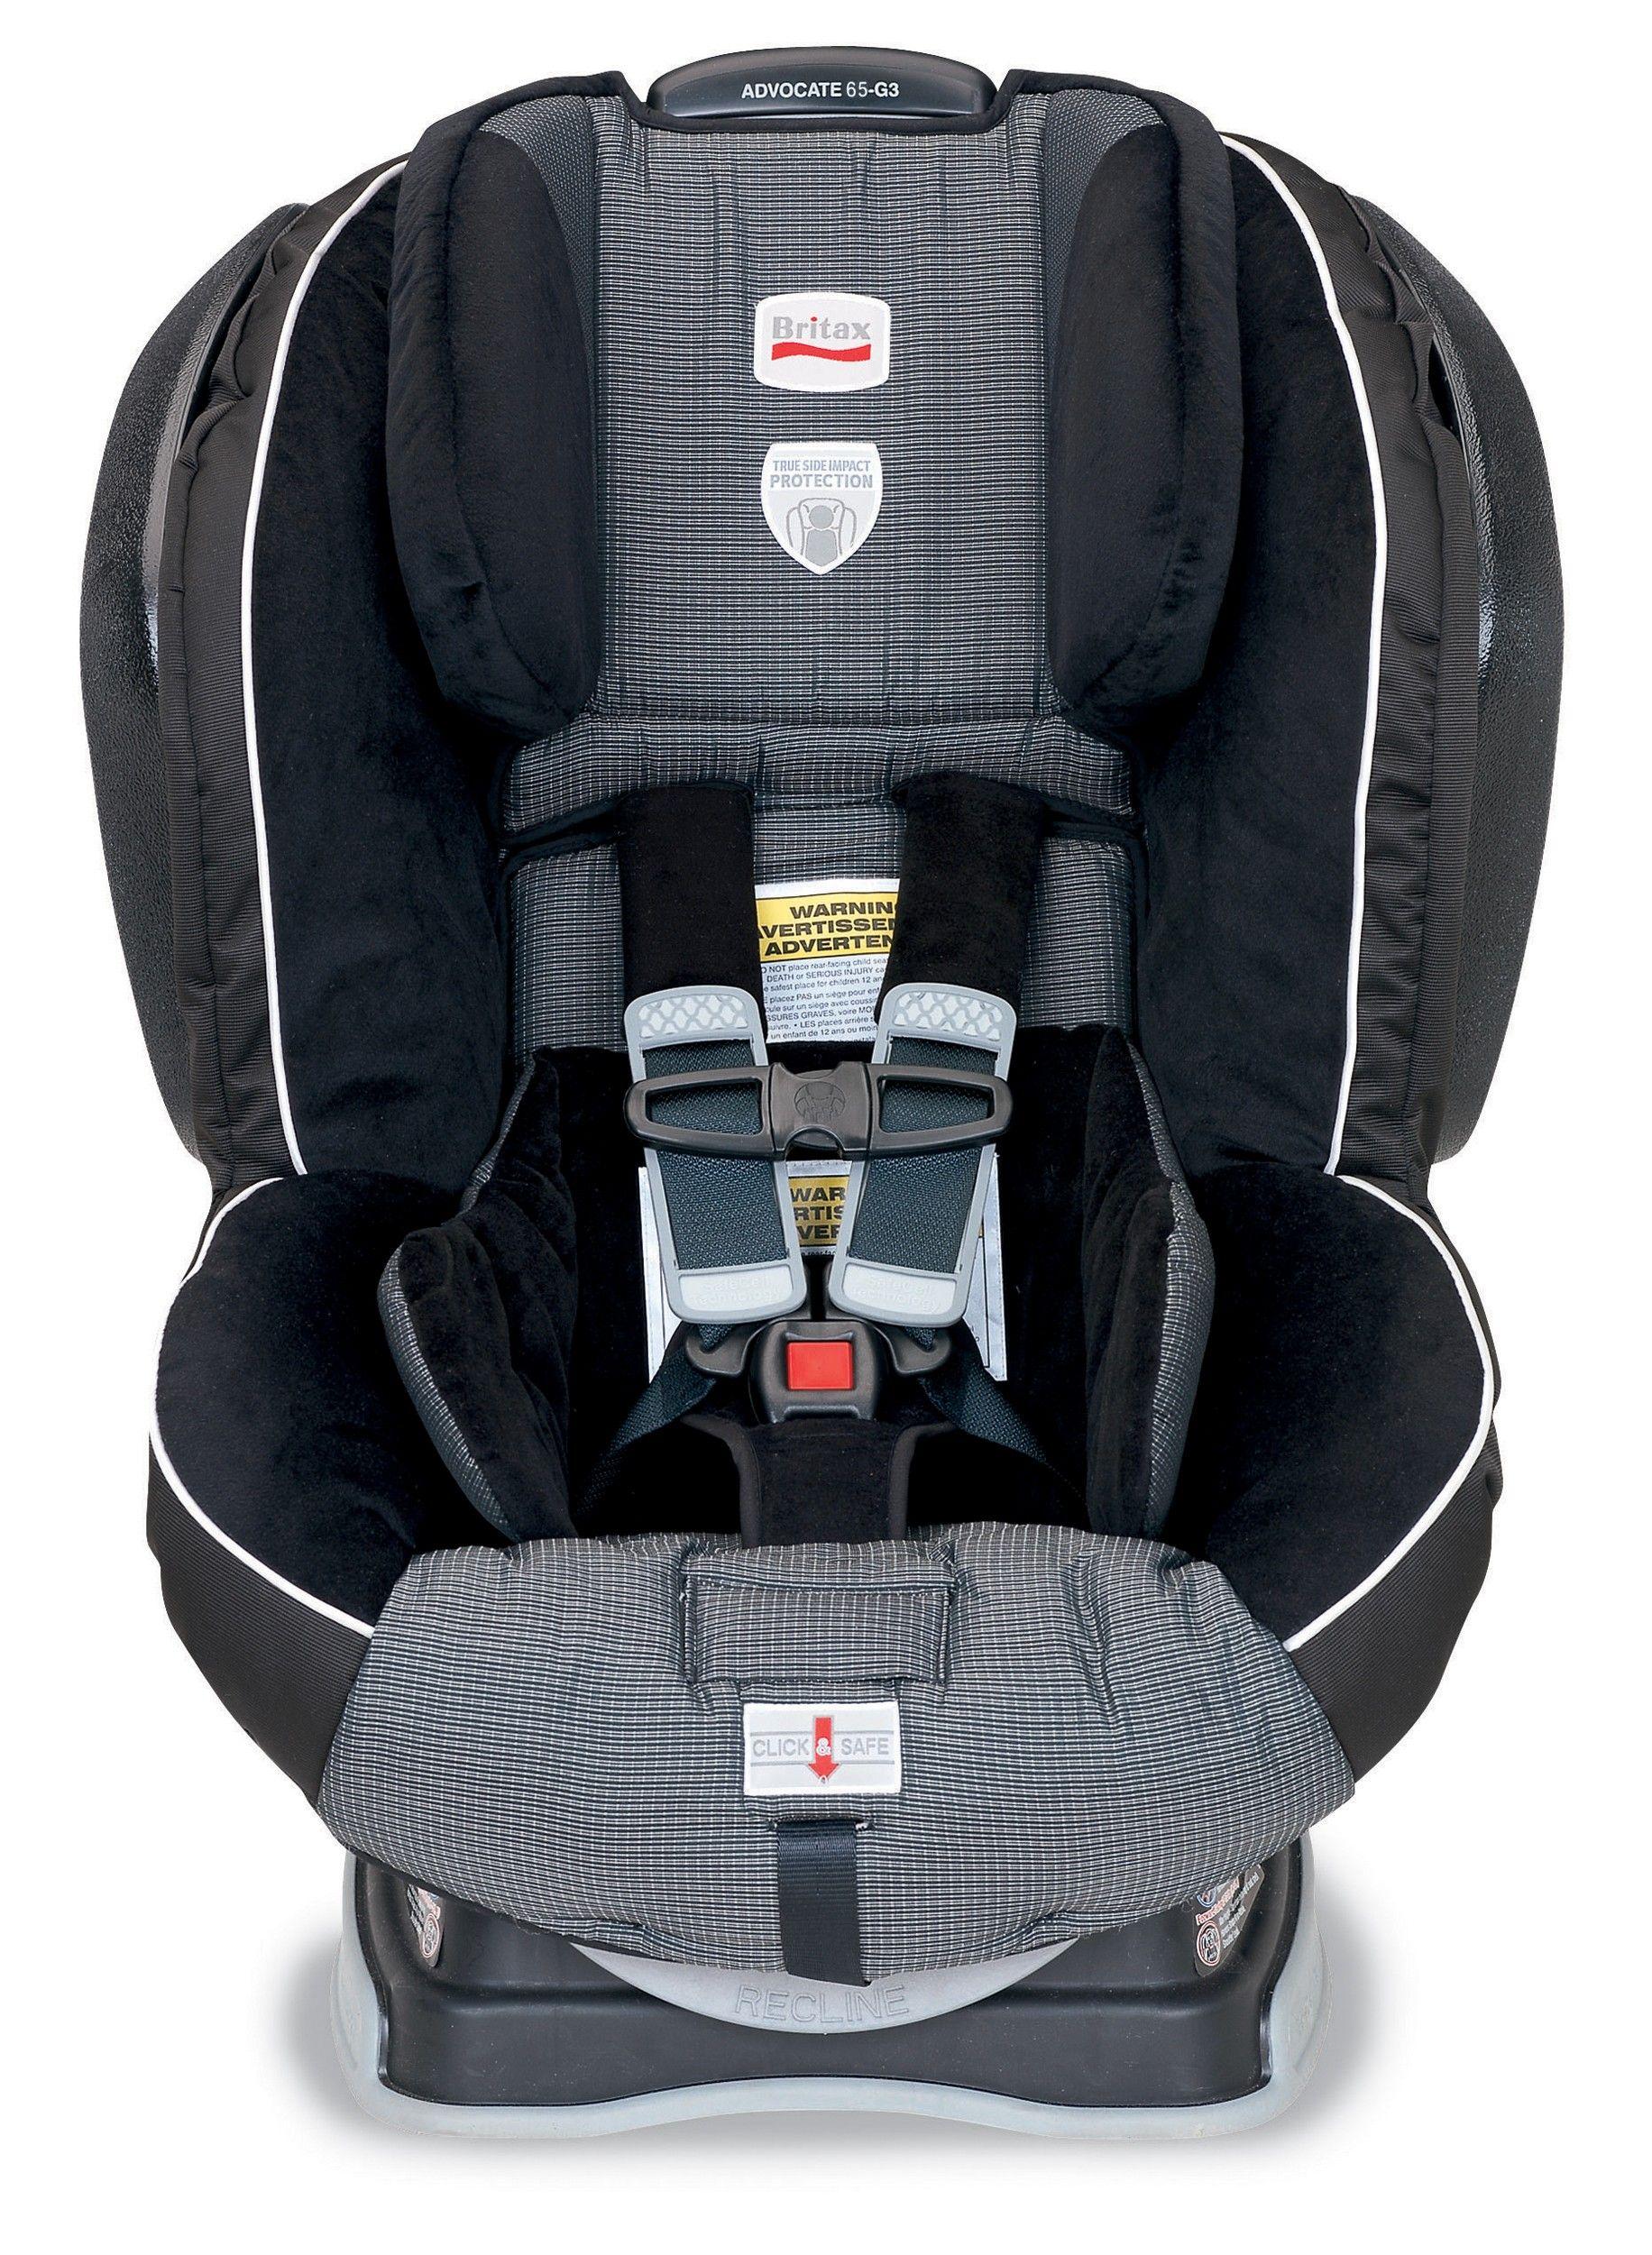 Care seat sale til feb 17 https://www.amazon.co.uk/Baby-Car-Mirror